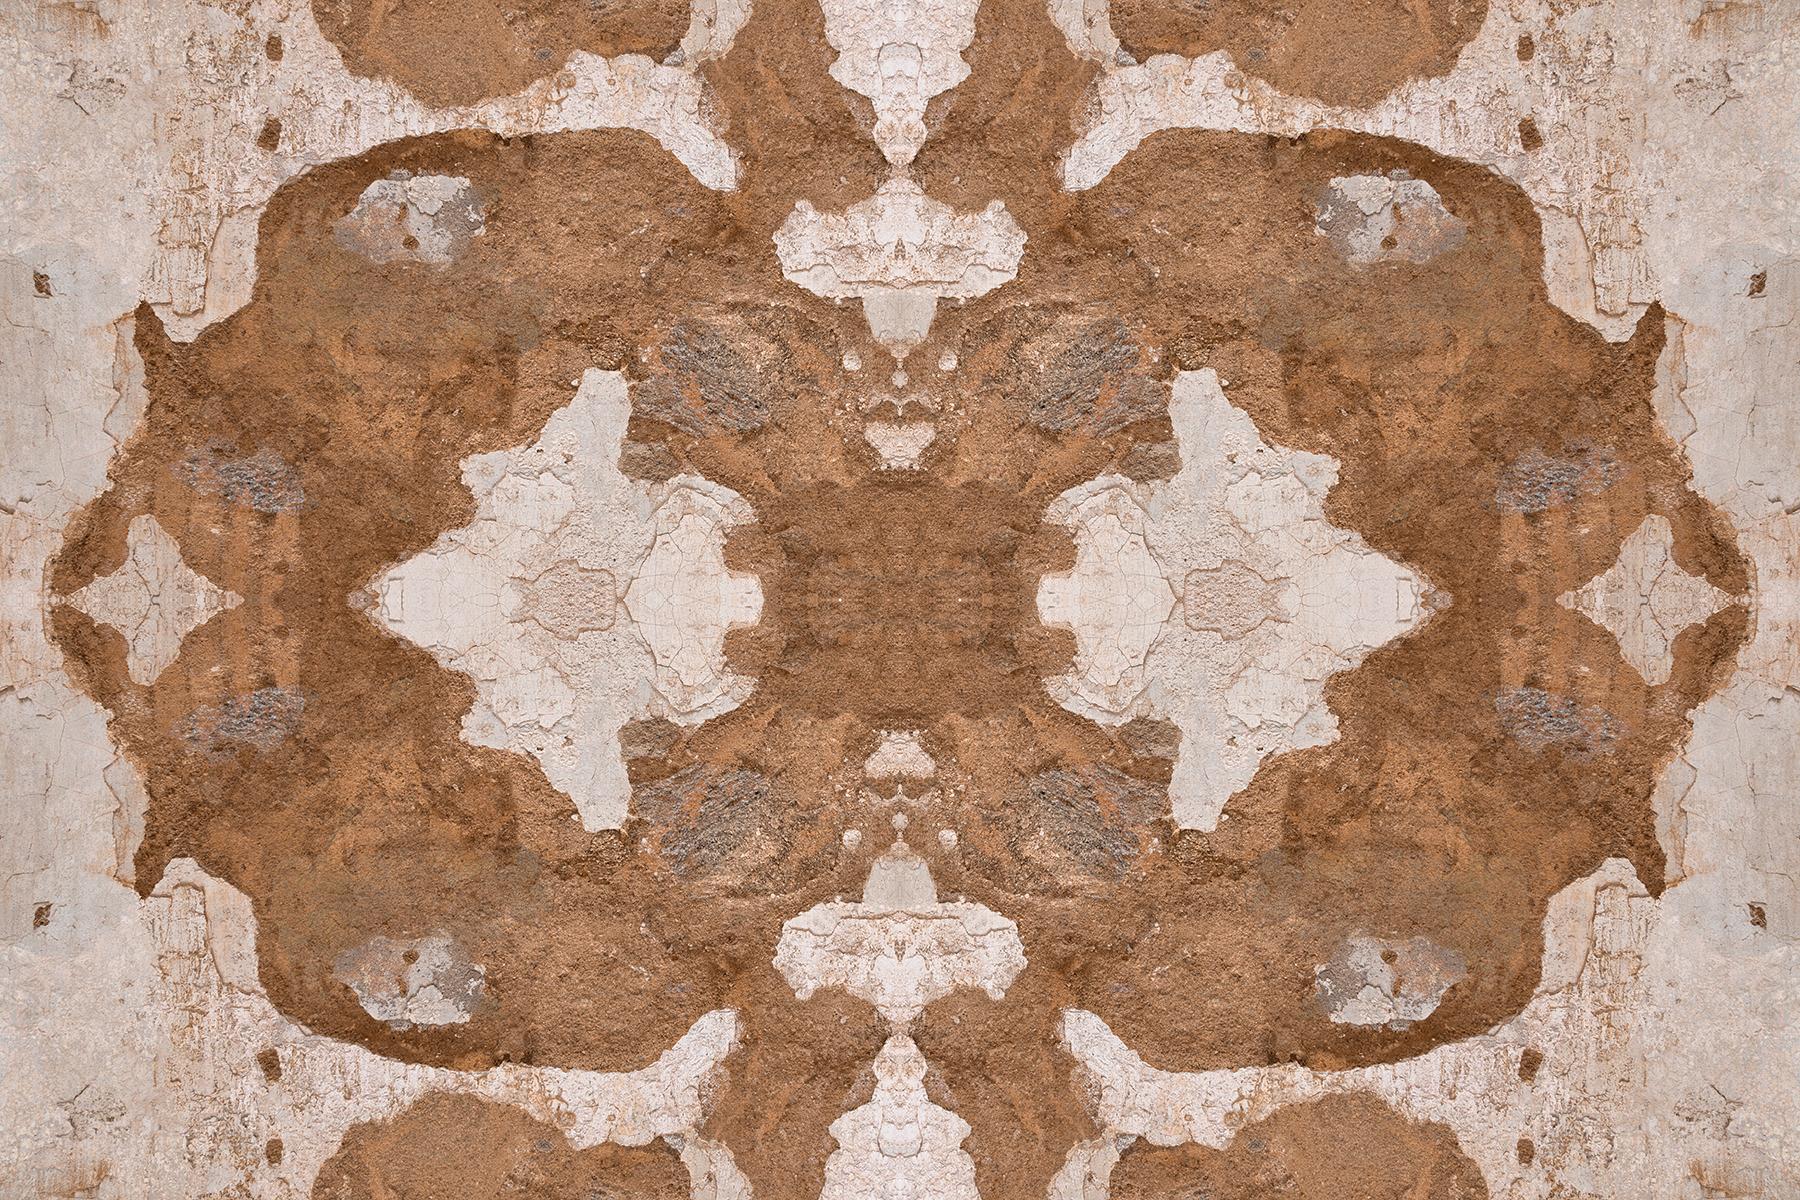 Rorschach grunge wall - hdr texture photo